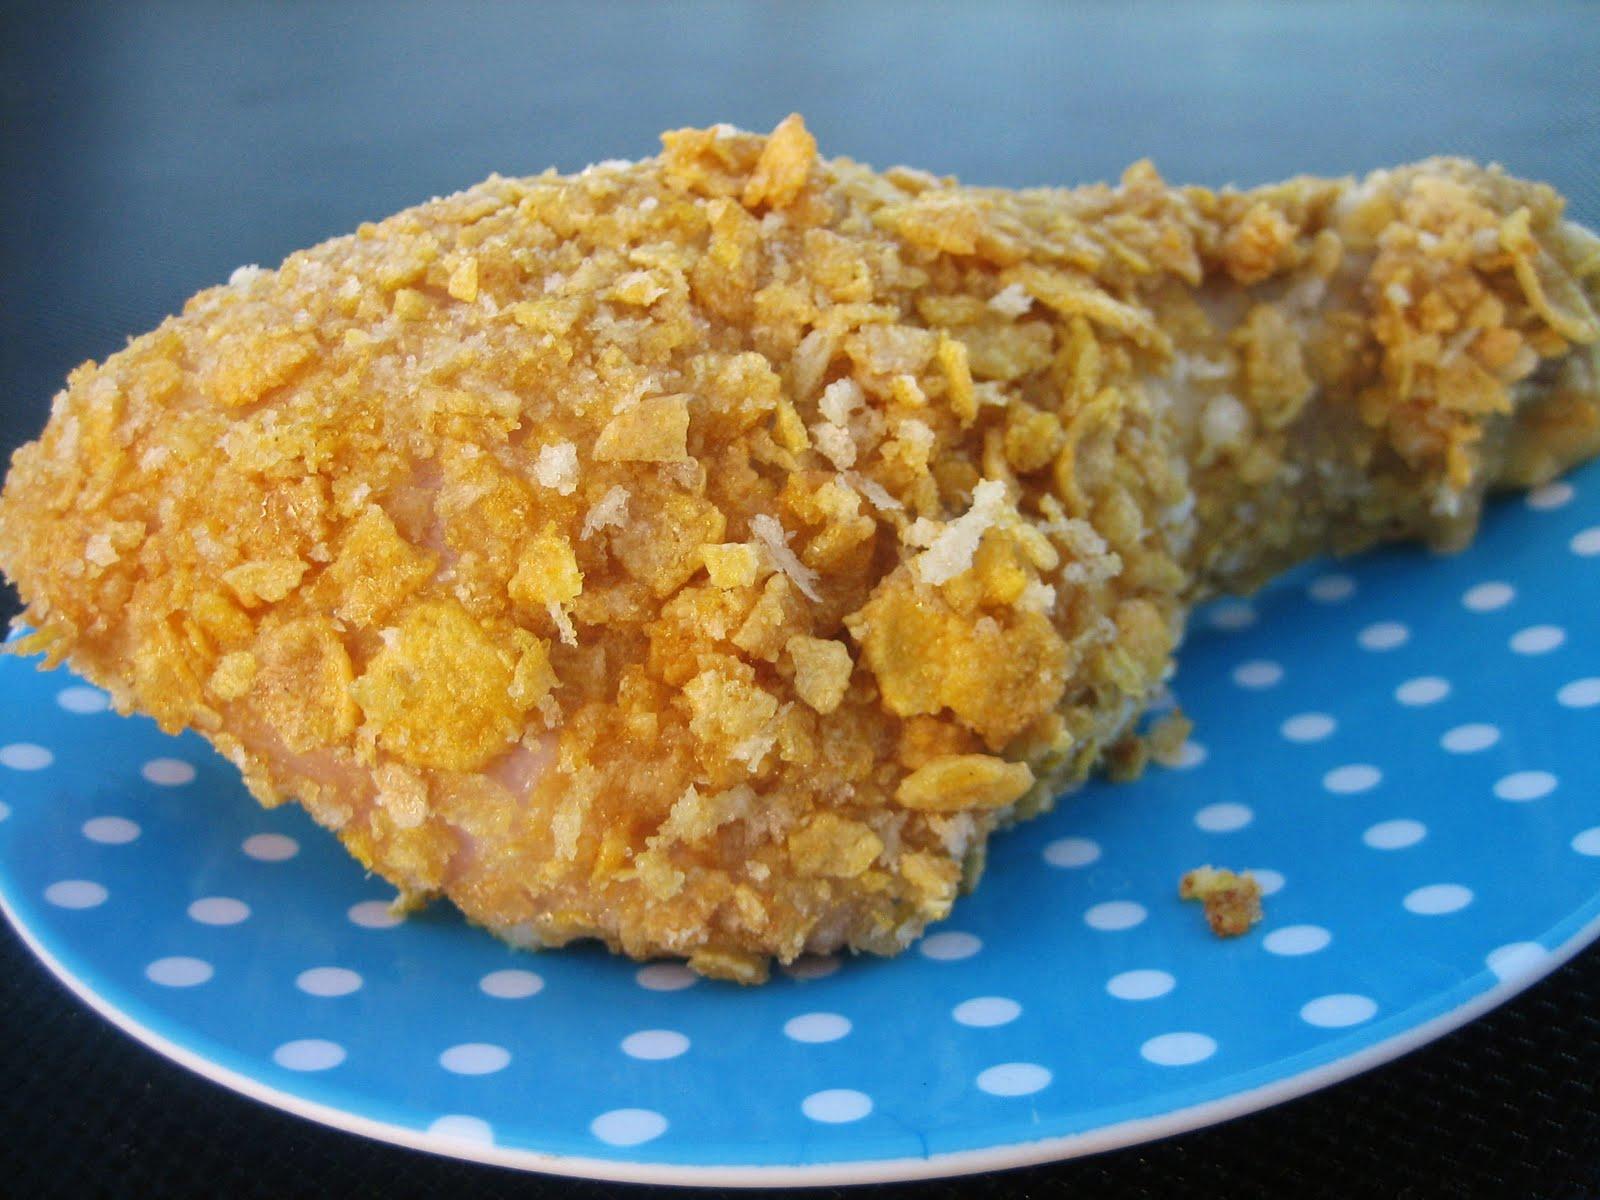 Chef Tess Bakeresse: Crispy Oven Baked Chicken drumsticks